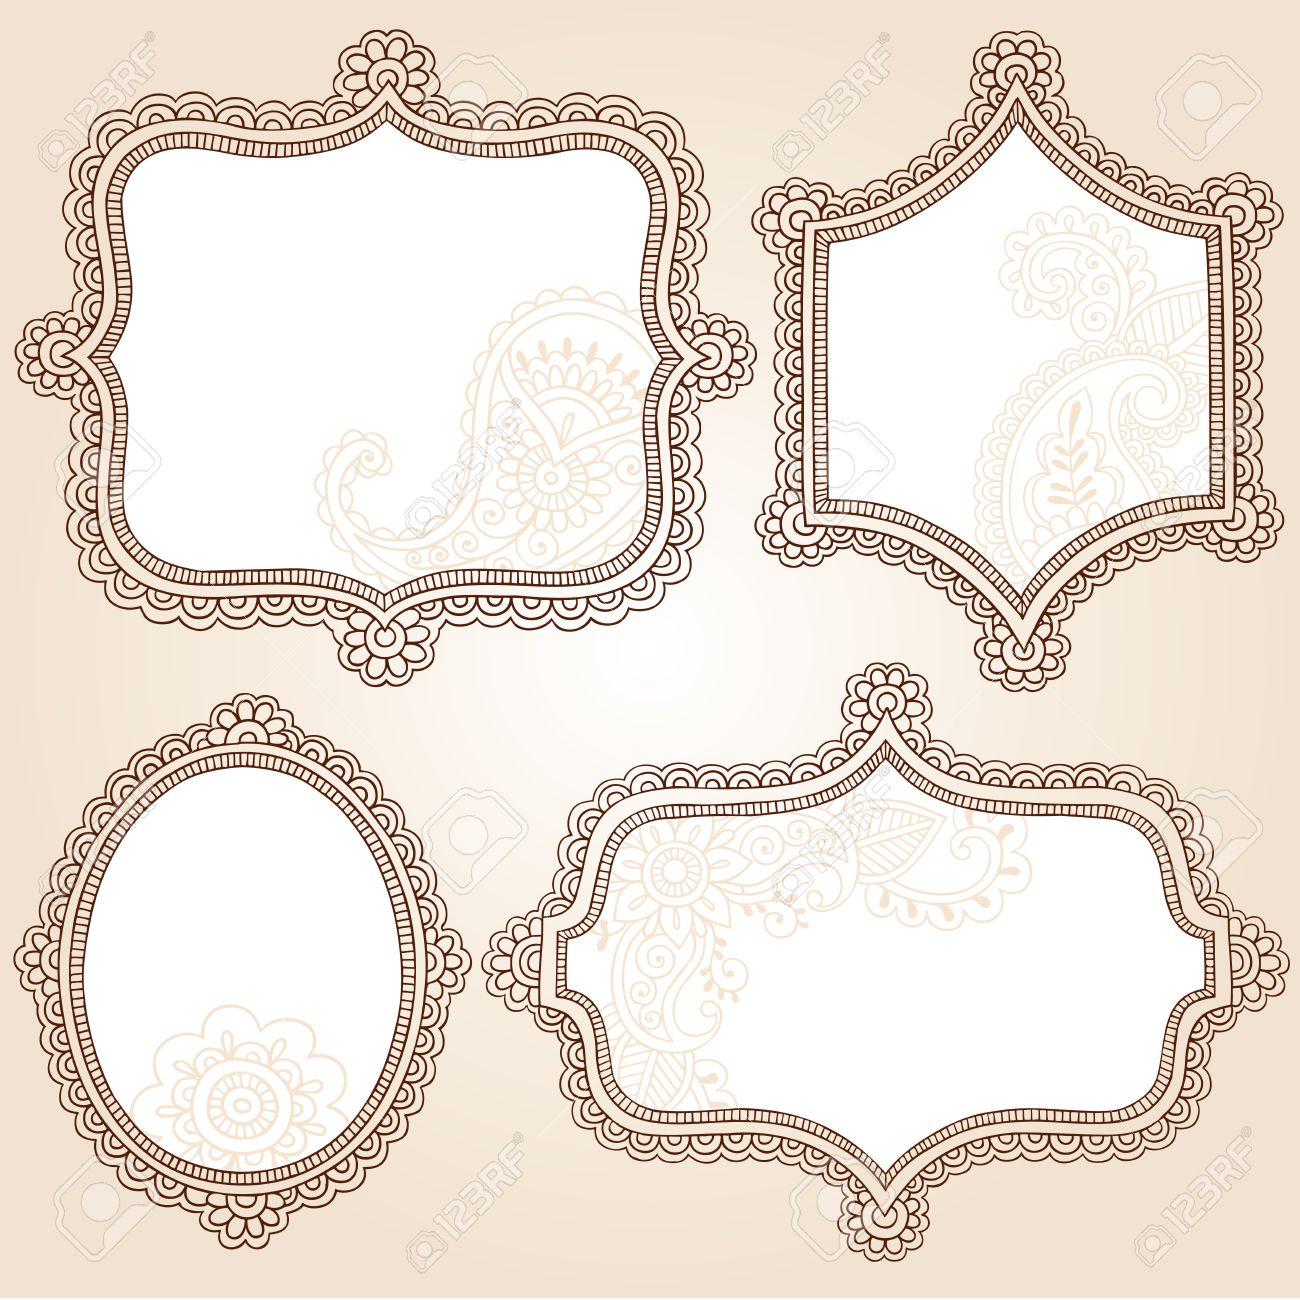 Henna Vintage Frames Mehndi Doodles Paisley Design Elements Set- Vector Illustration Stock Vector - 12843782